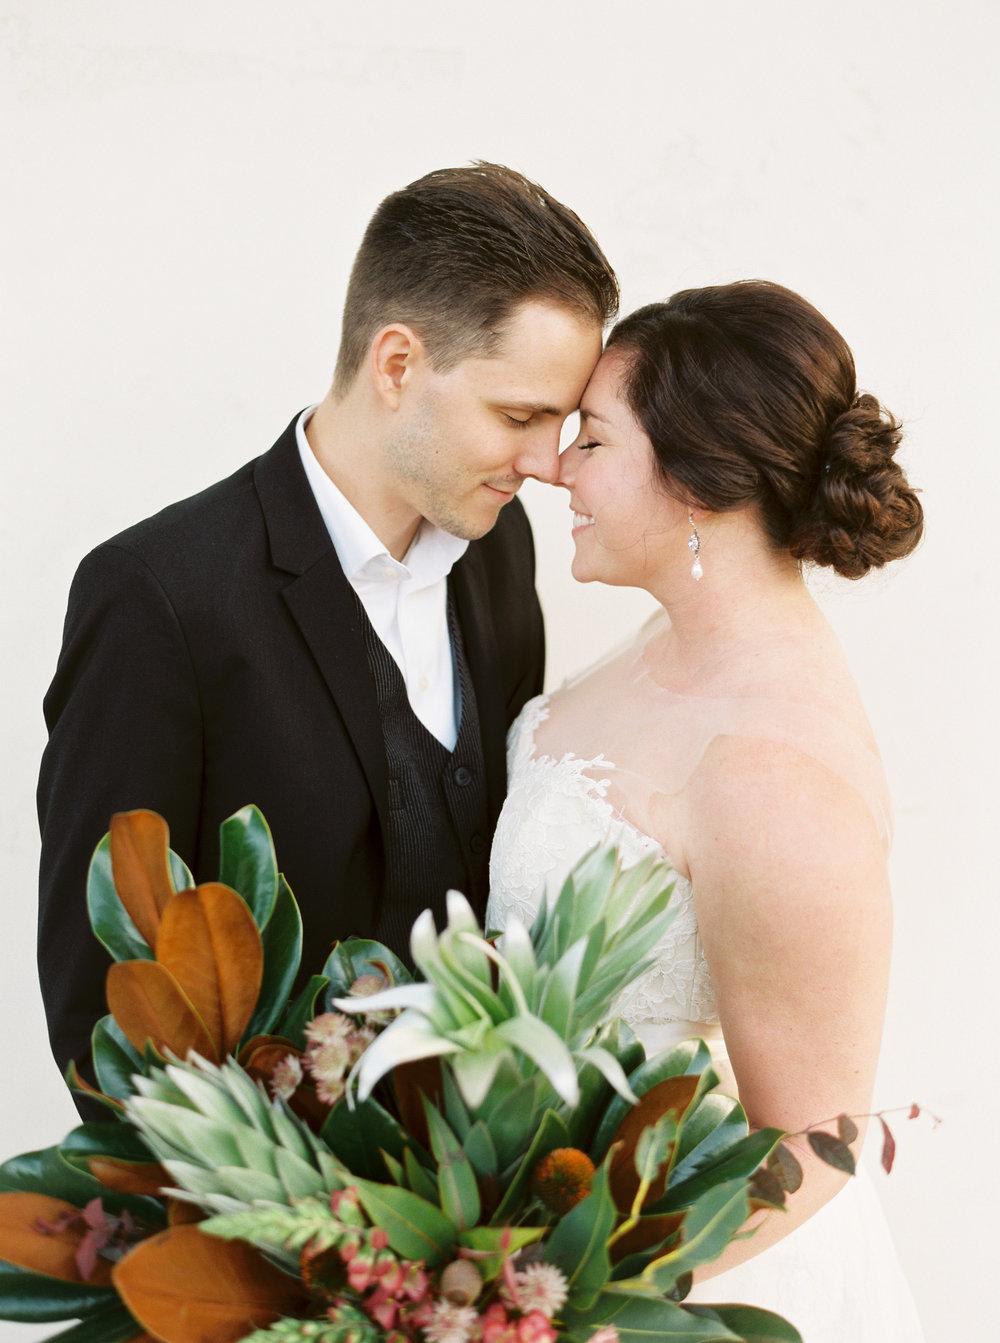 boho-inspired-wedding-at-casa-bella-in-sunol-california-111.jpg